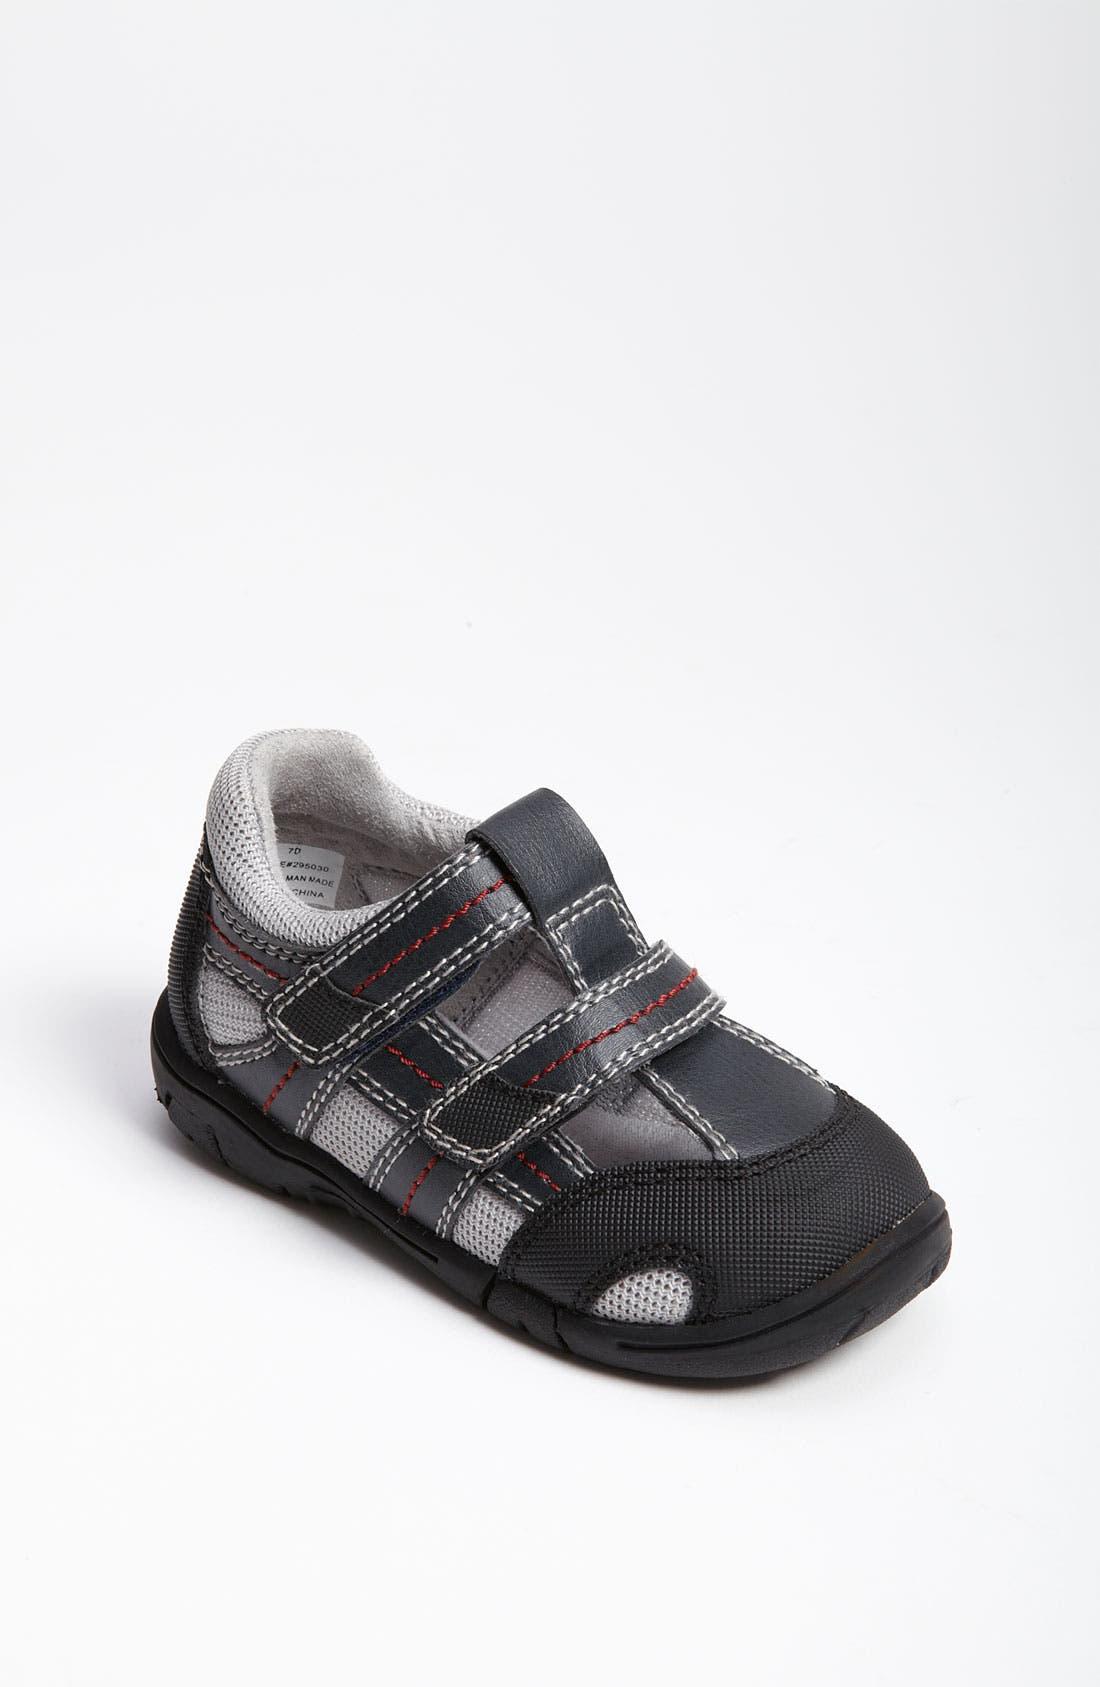 Alternate Image 1 Selected - Jumping Jacks 'All Terrain' Sneaker (Walker & Toddler)